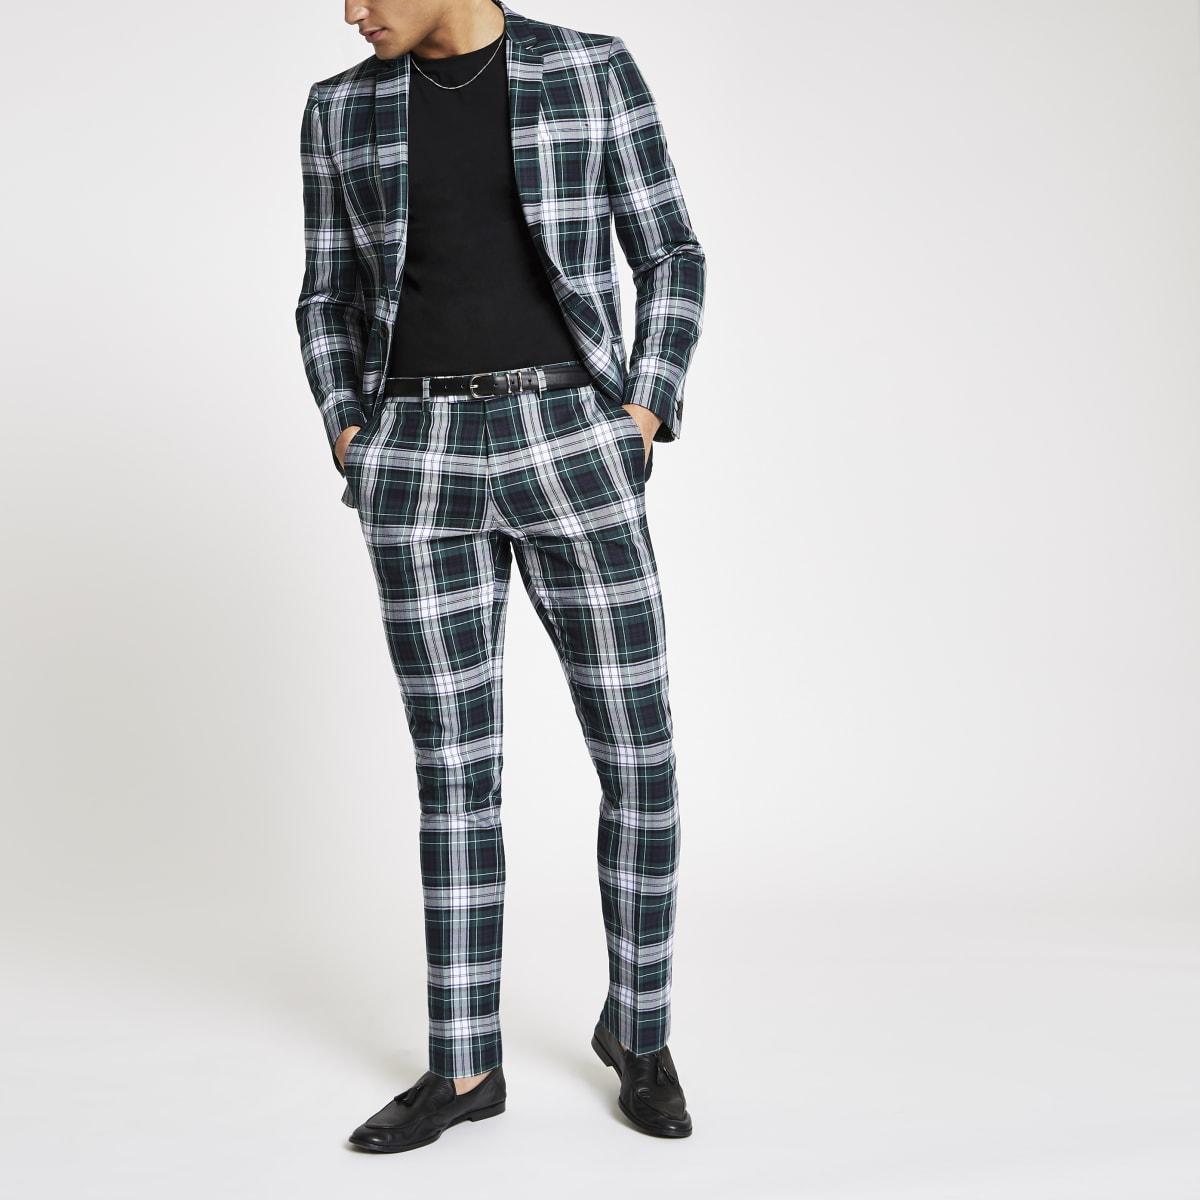 Green plaid super skinny fit suit pants